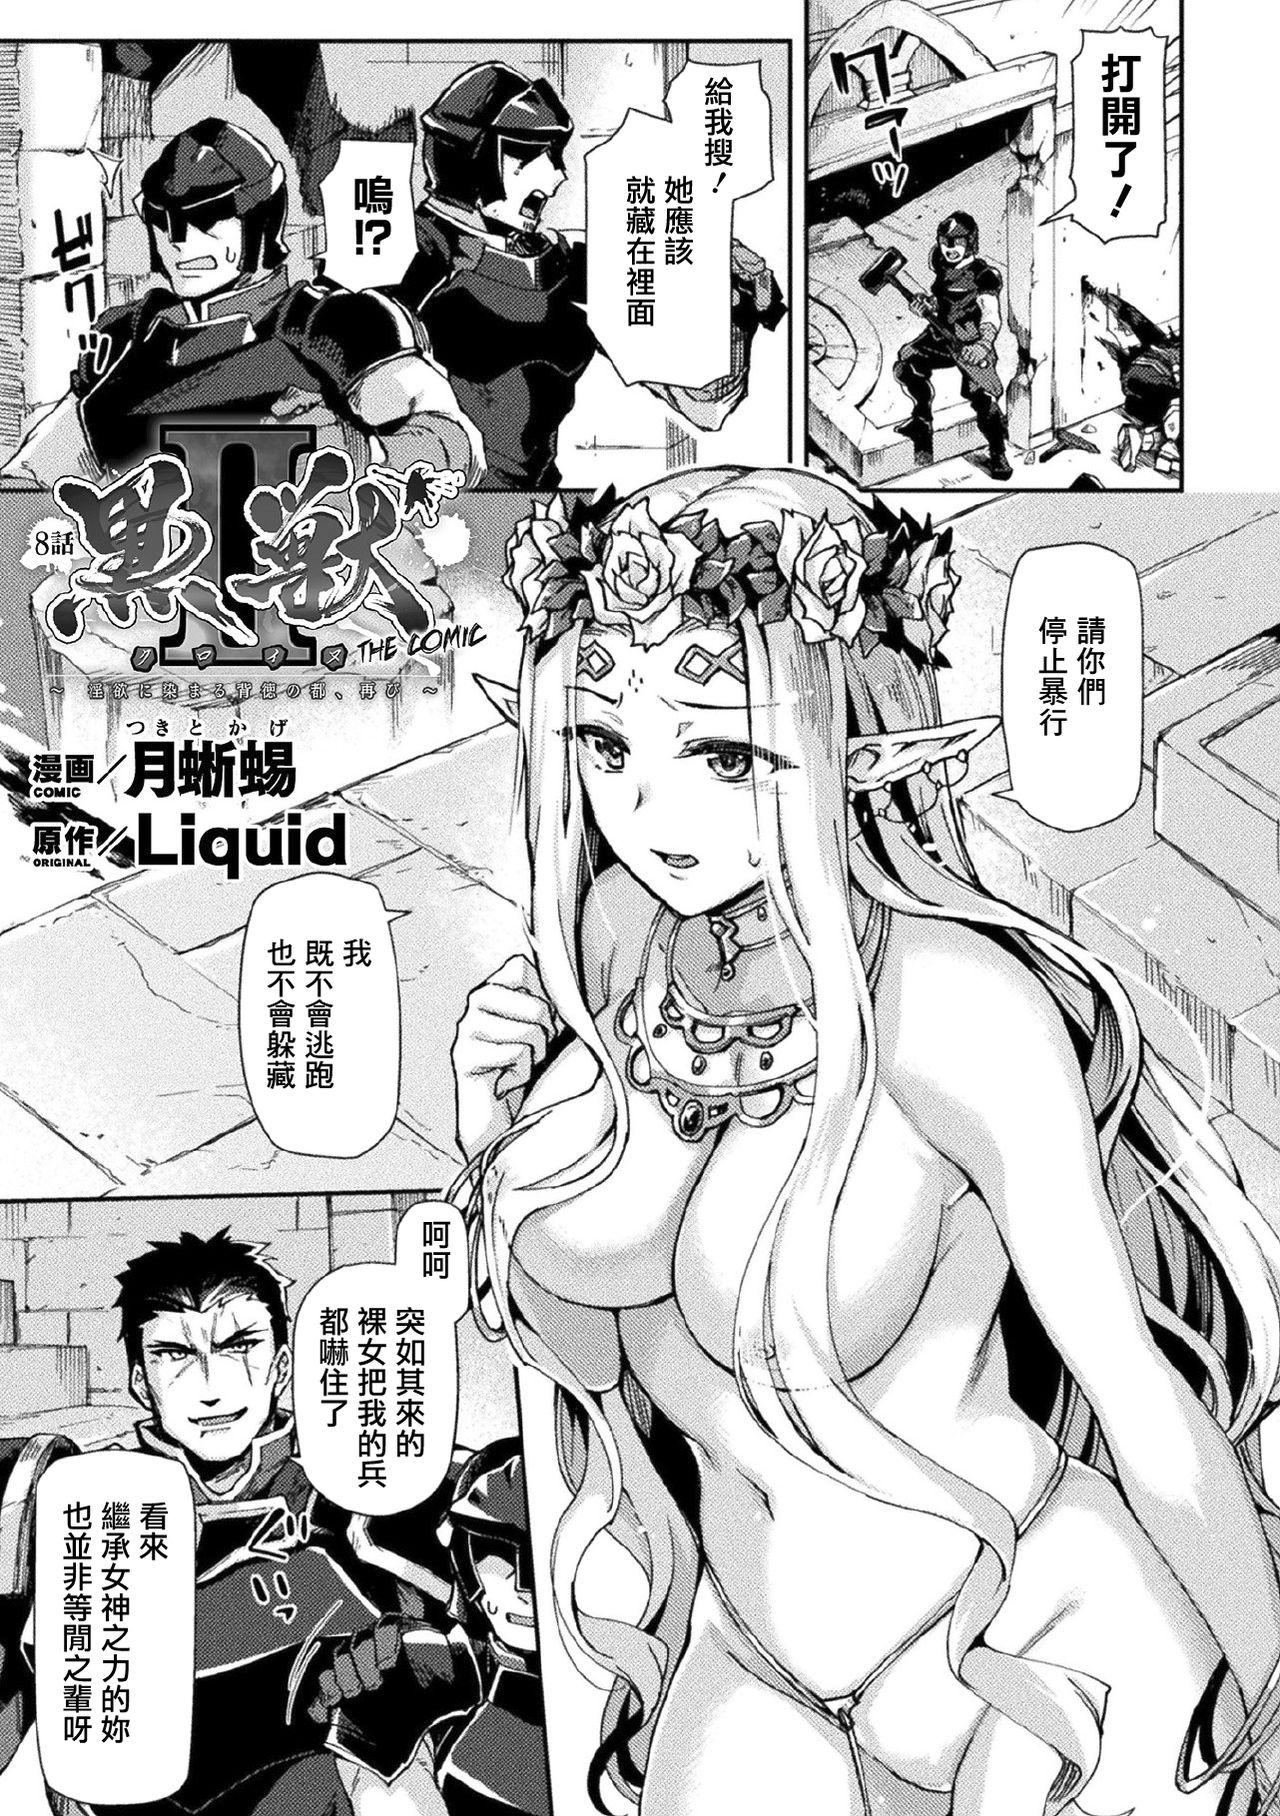 [Tsukitokage] Kuroinu II ~Inyoku ni Somaru Haitoku no Miyako, Futatabi~ THE COMIC Chapter 8 (Kukkoro Heroines Vol. 11) [Digital] [Chinese] [鬼畜王漢化組] [Digital] 1